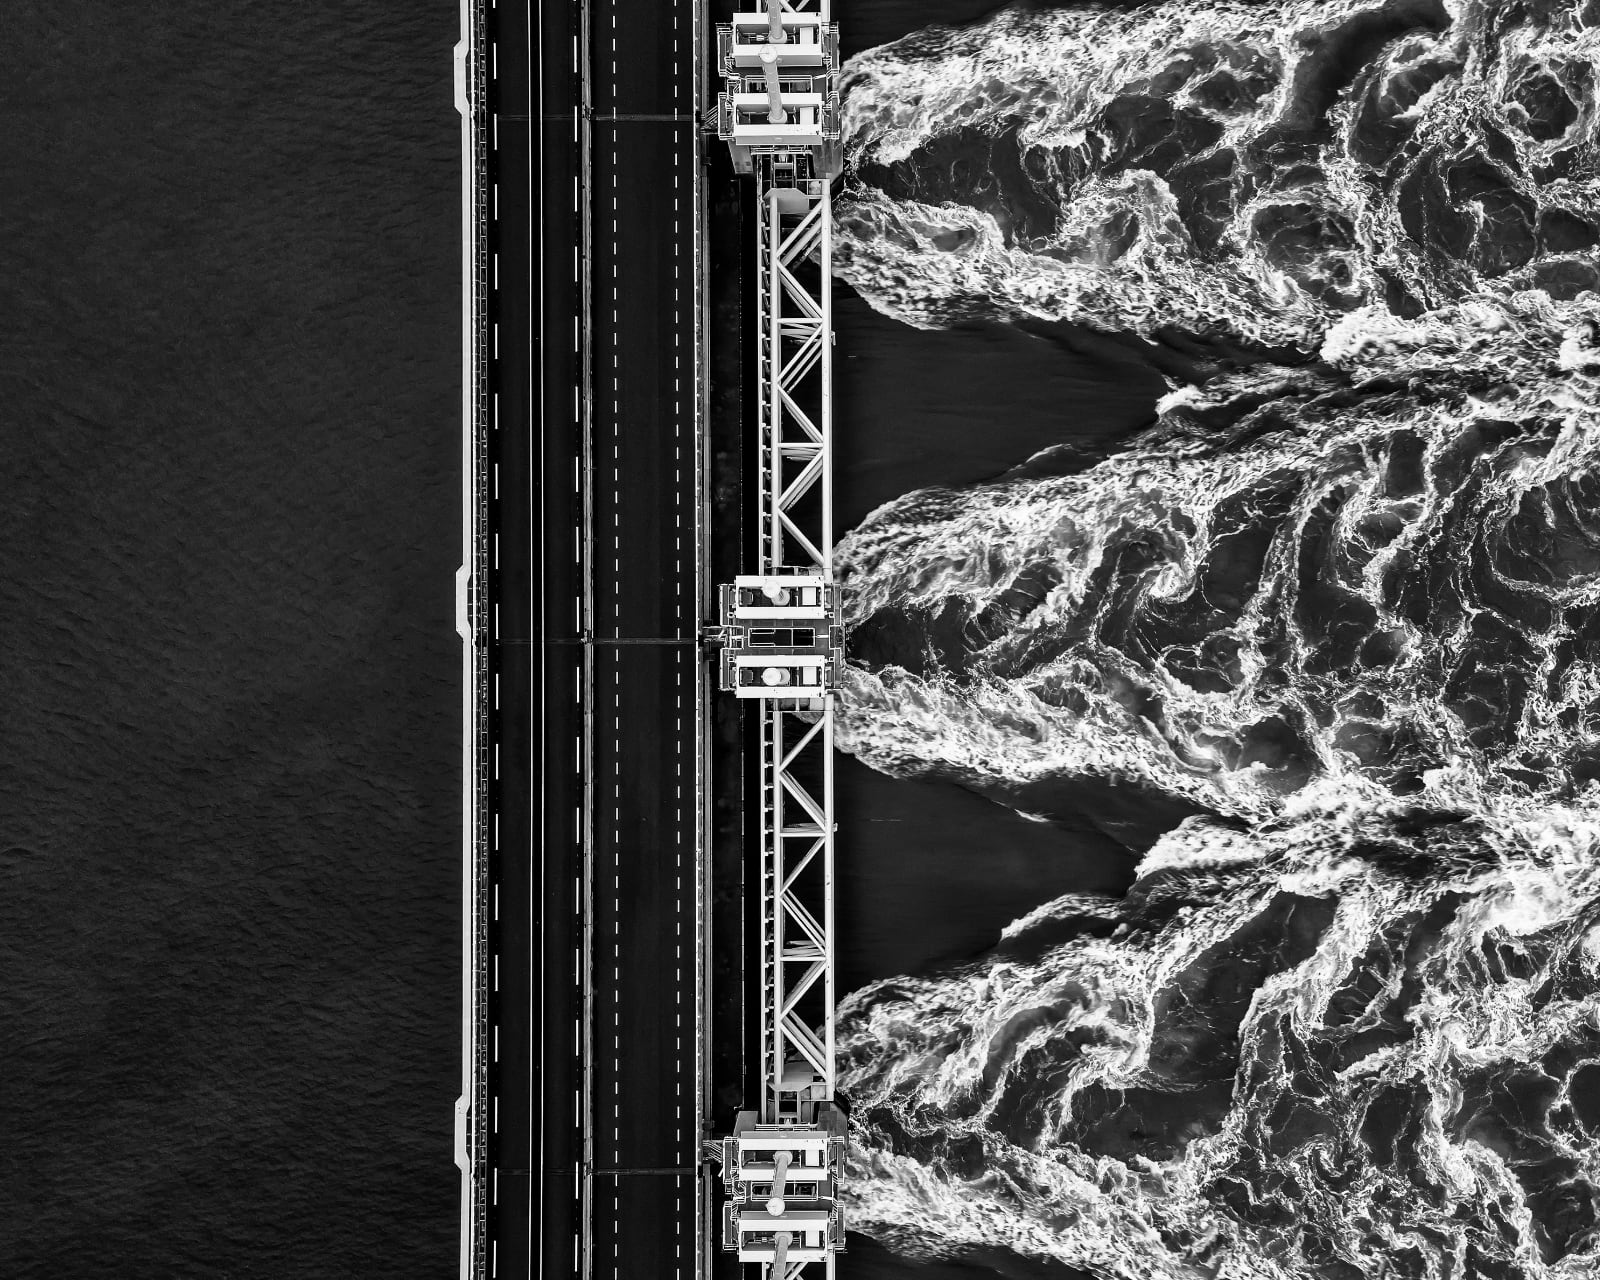 © Ruud Peters, Netherlands, Shortlist, Open, Motion, 2021 Sony World Photography Awards - luchtfoto Oosterscheldekering, X3